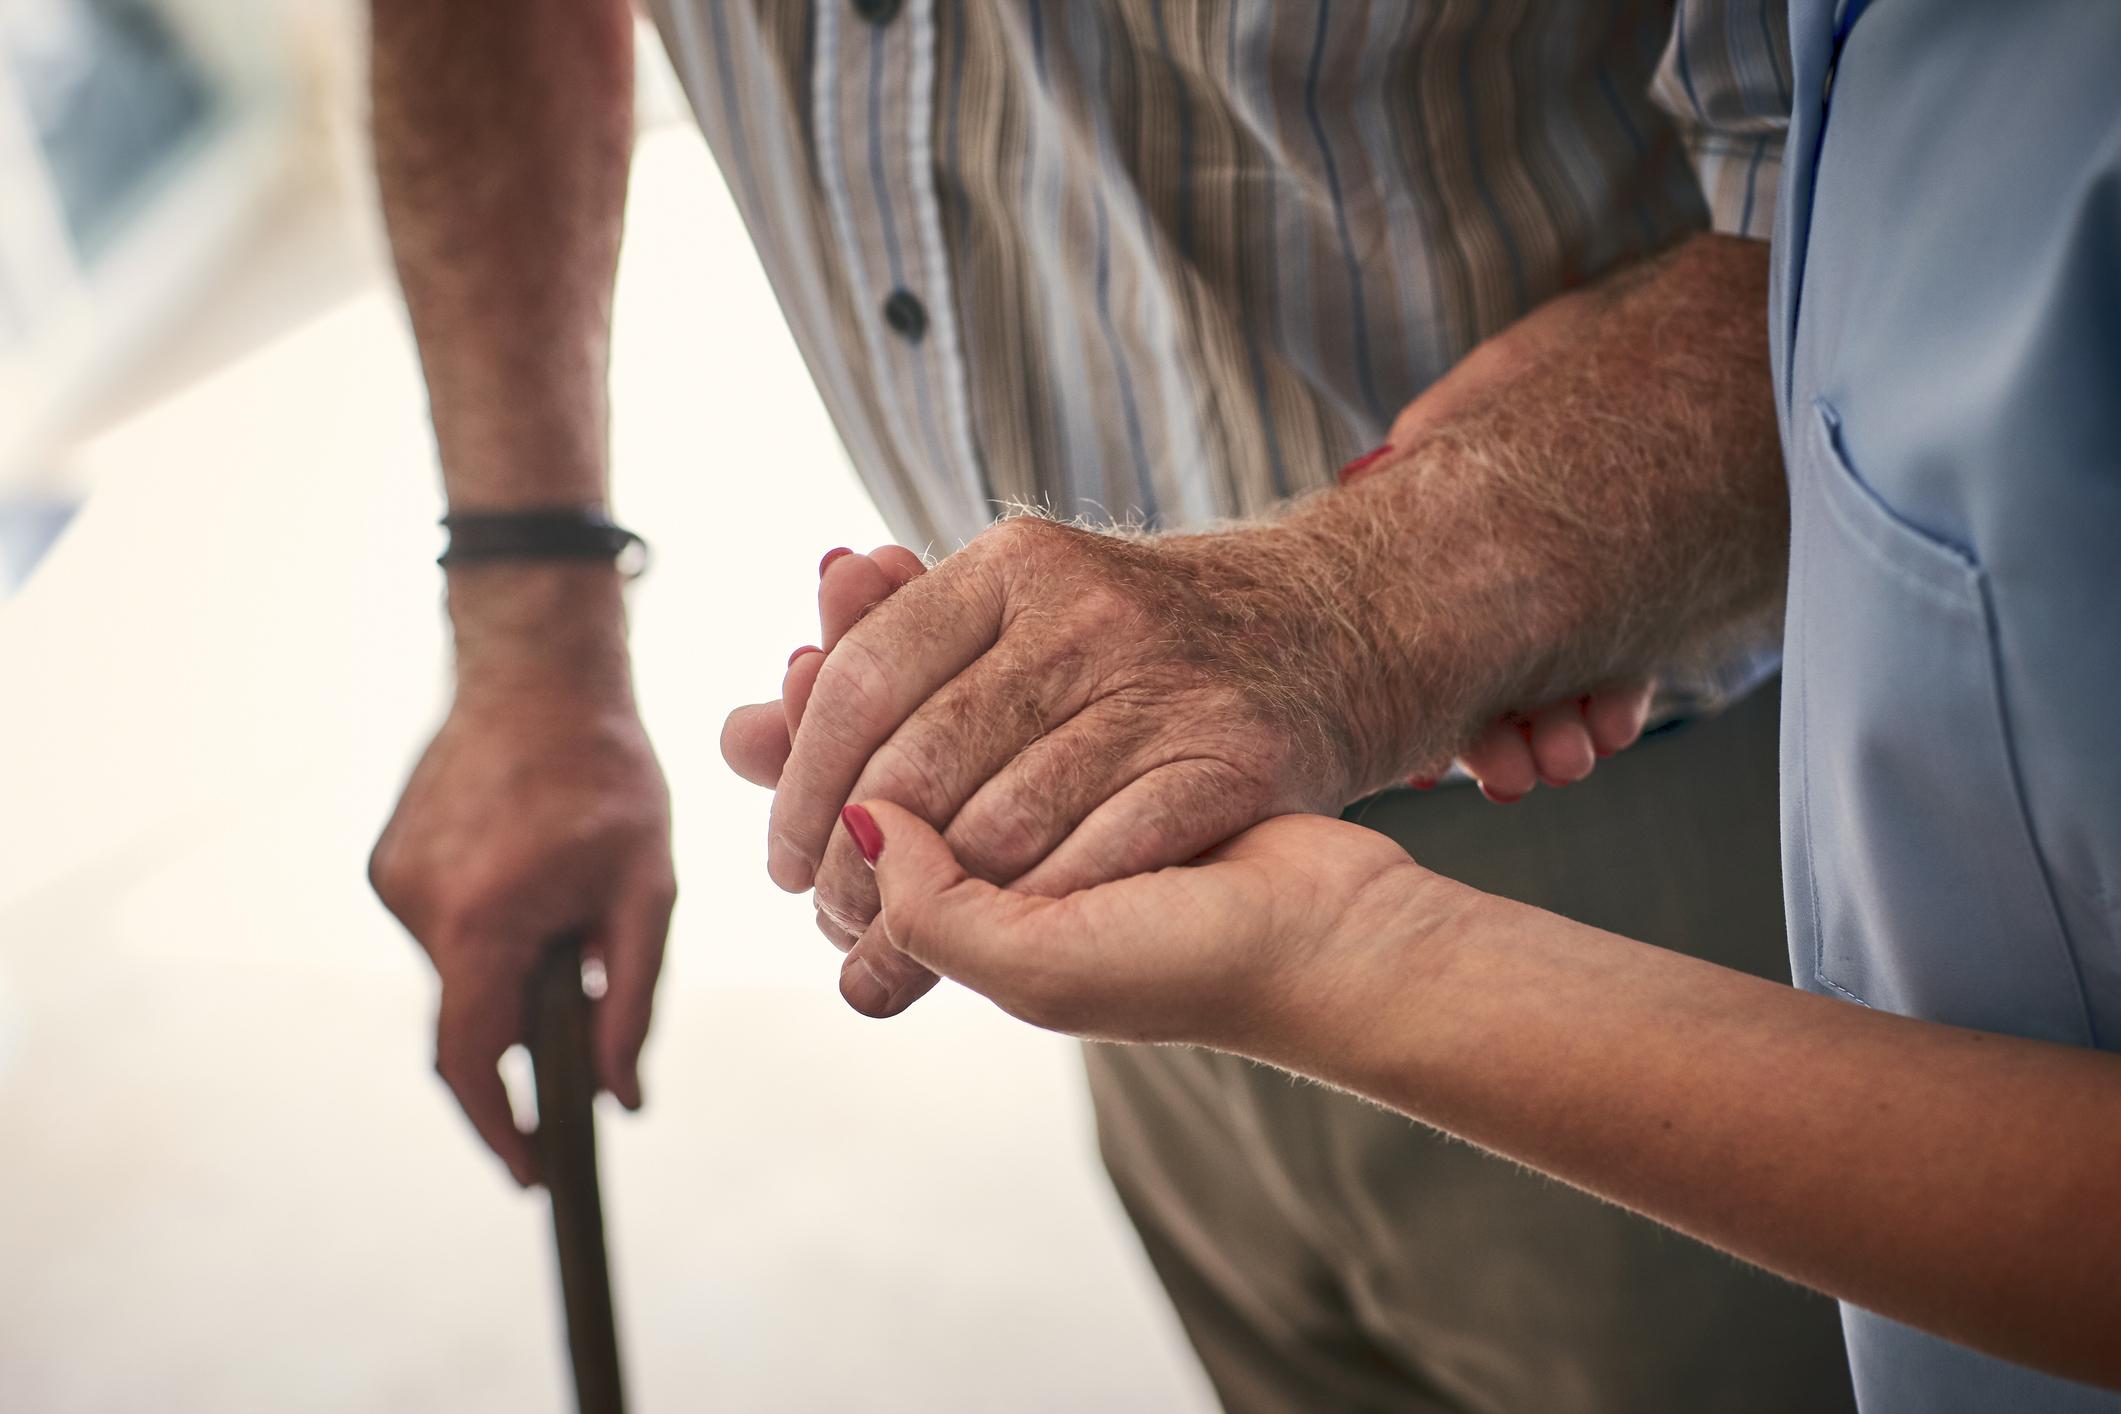 Quand aborder l'accompagnement de fin de vie avec ses proches - Odella.fr